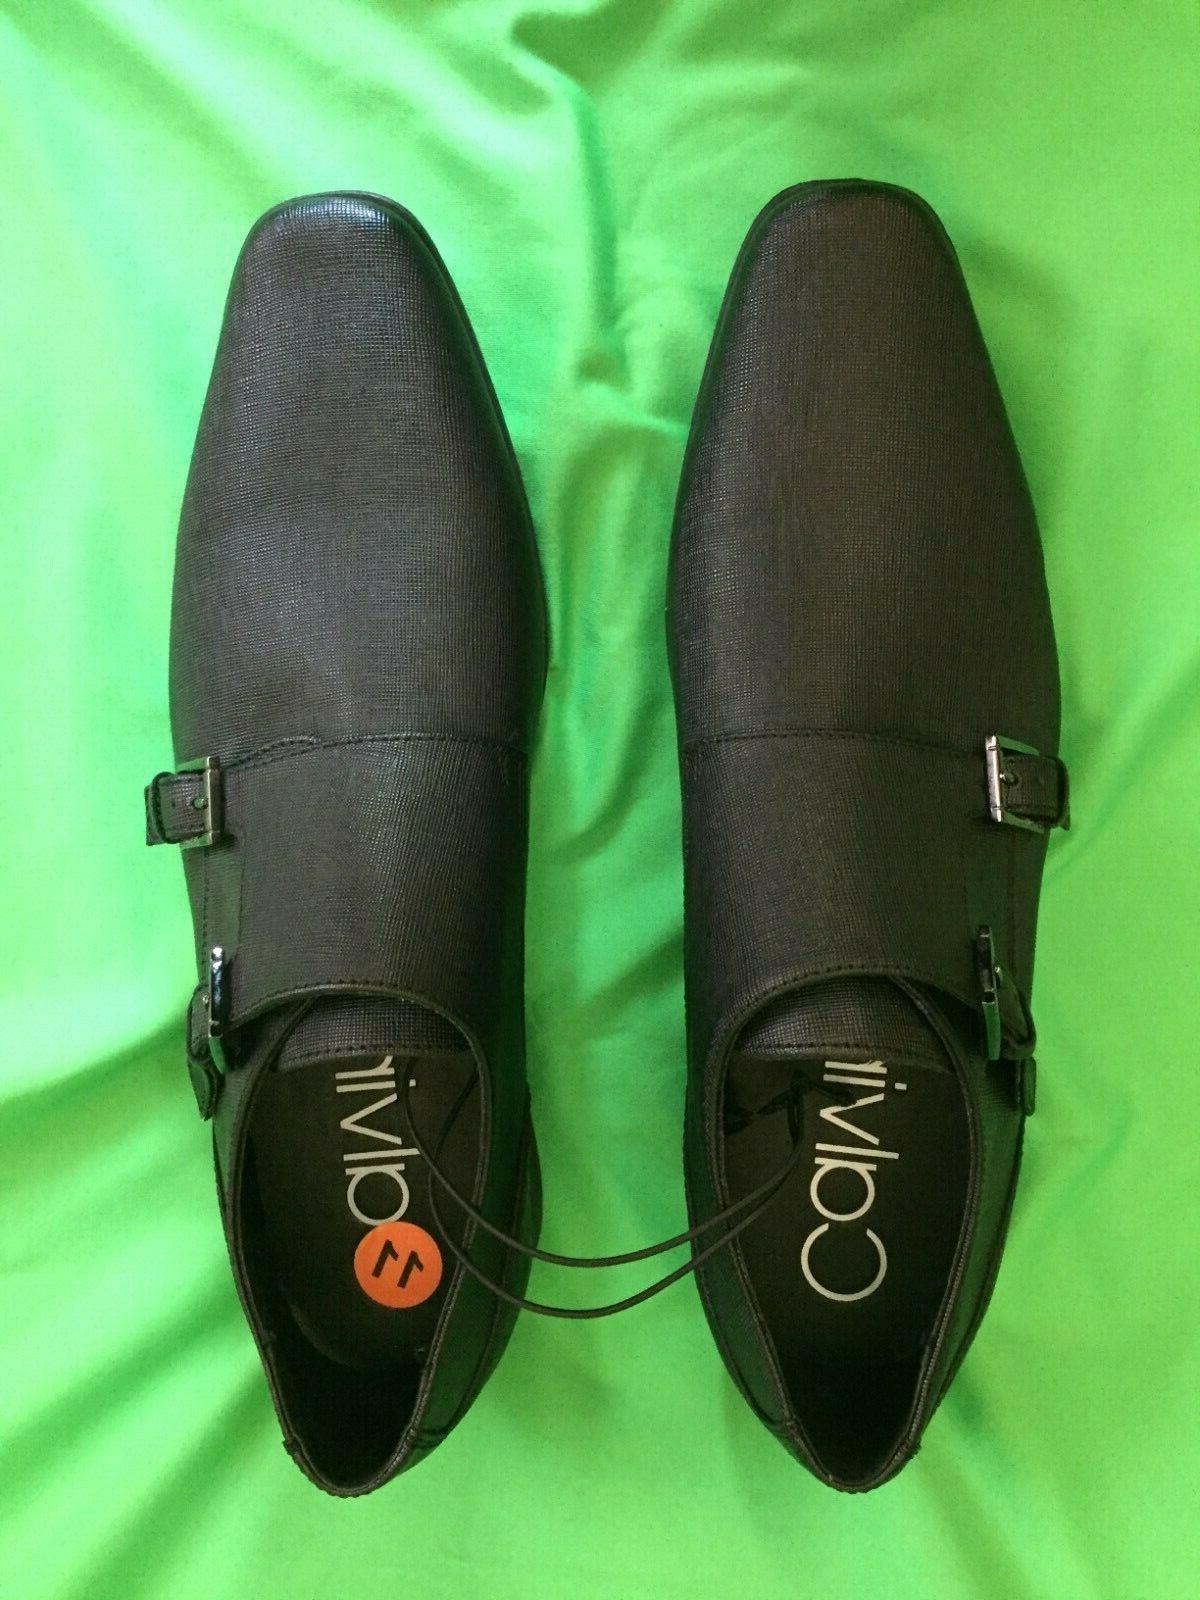 men s butler black oxfords shoes size